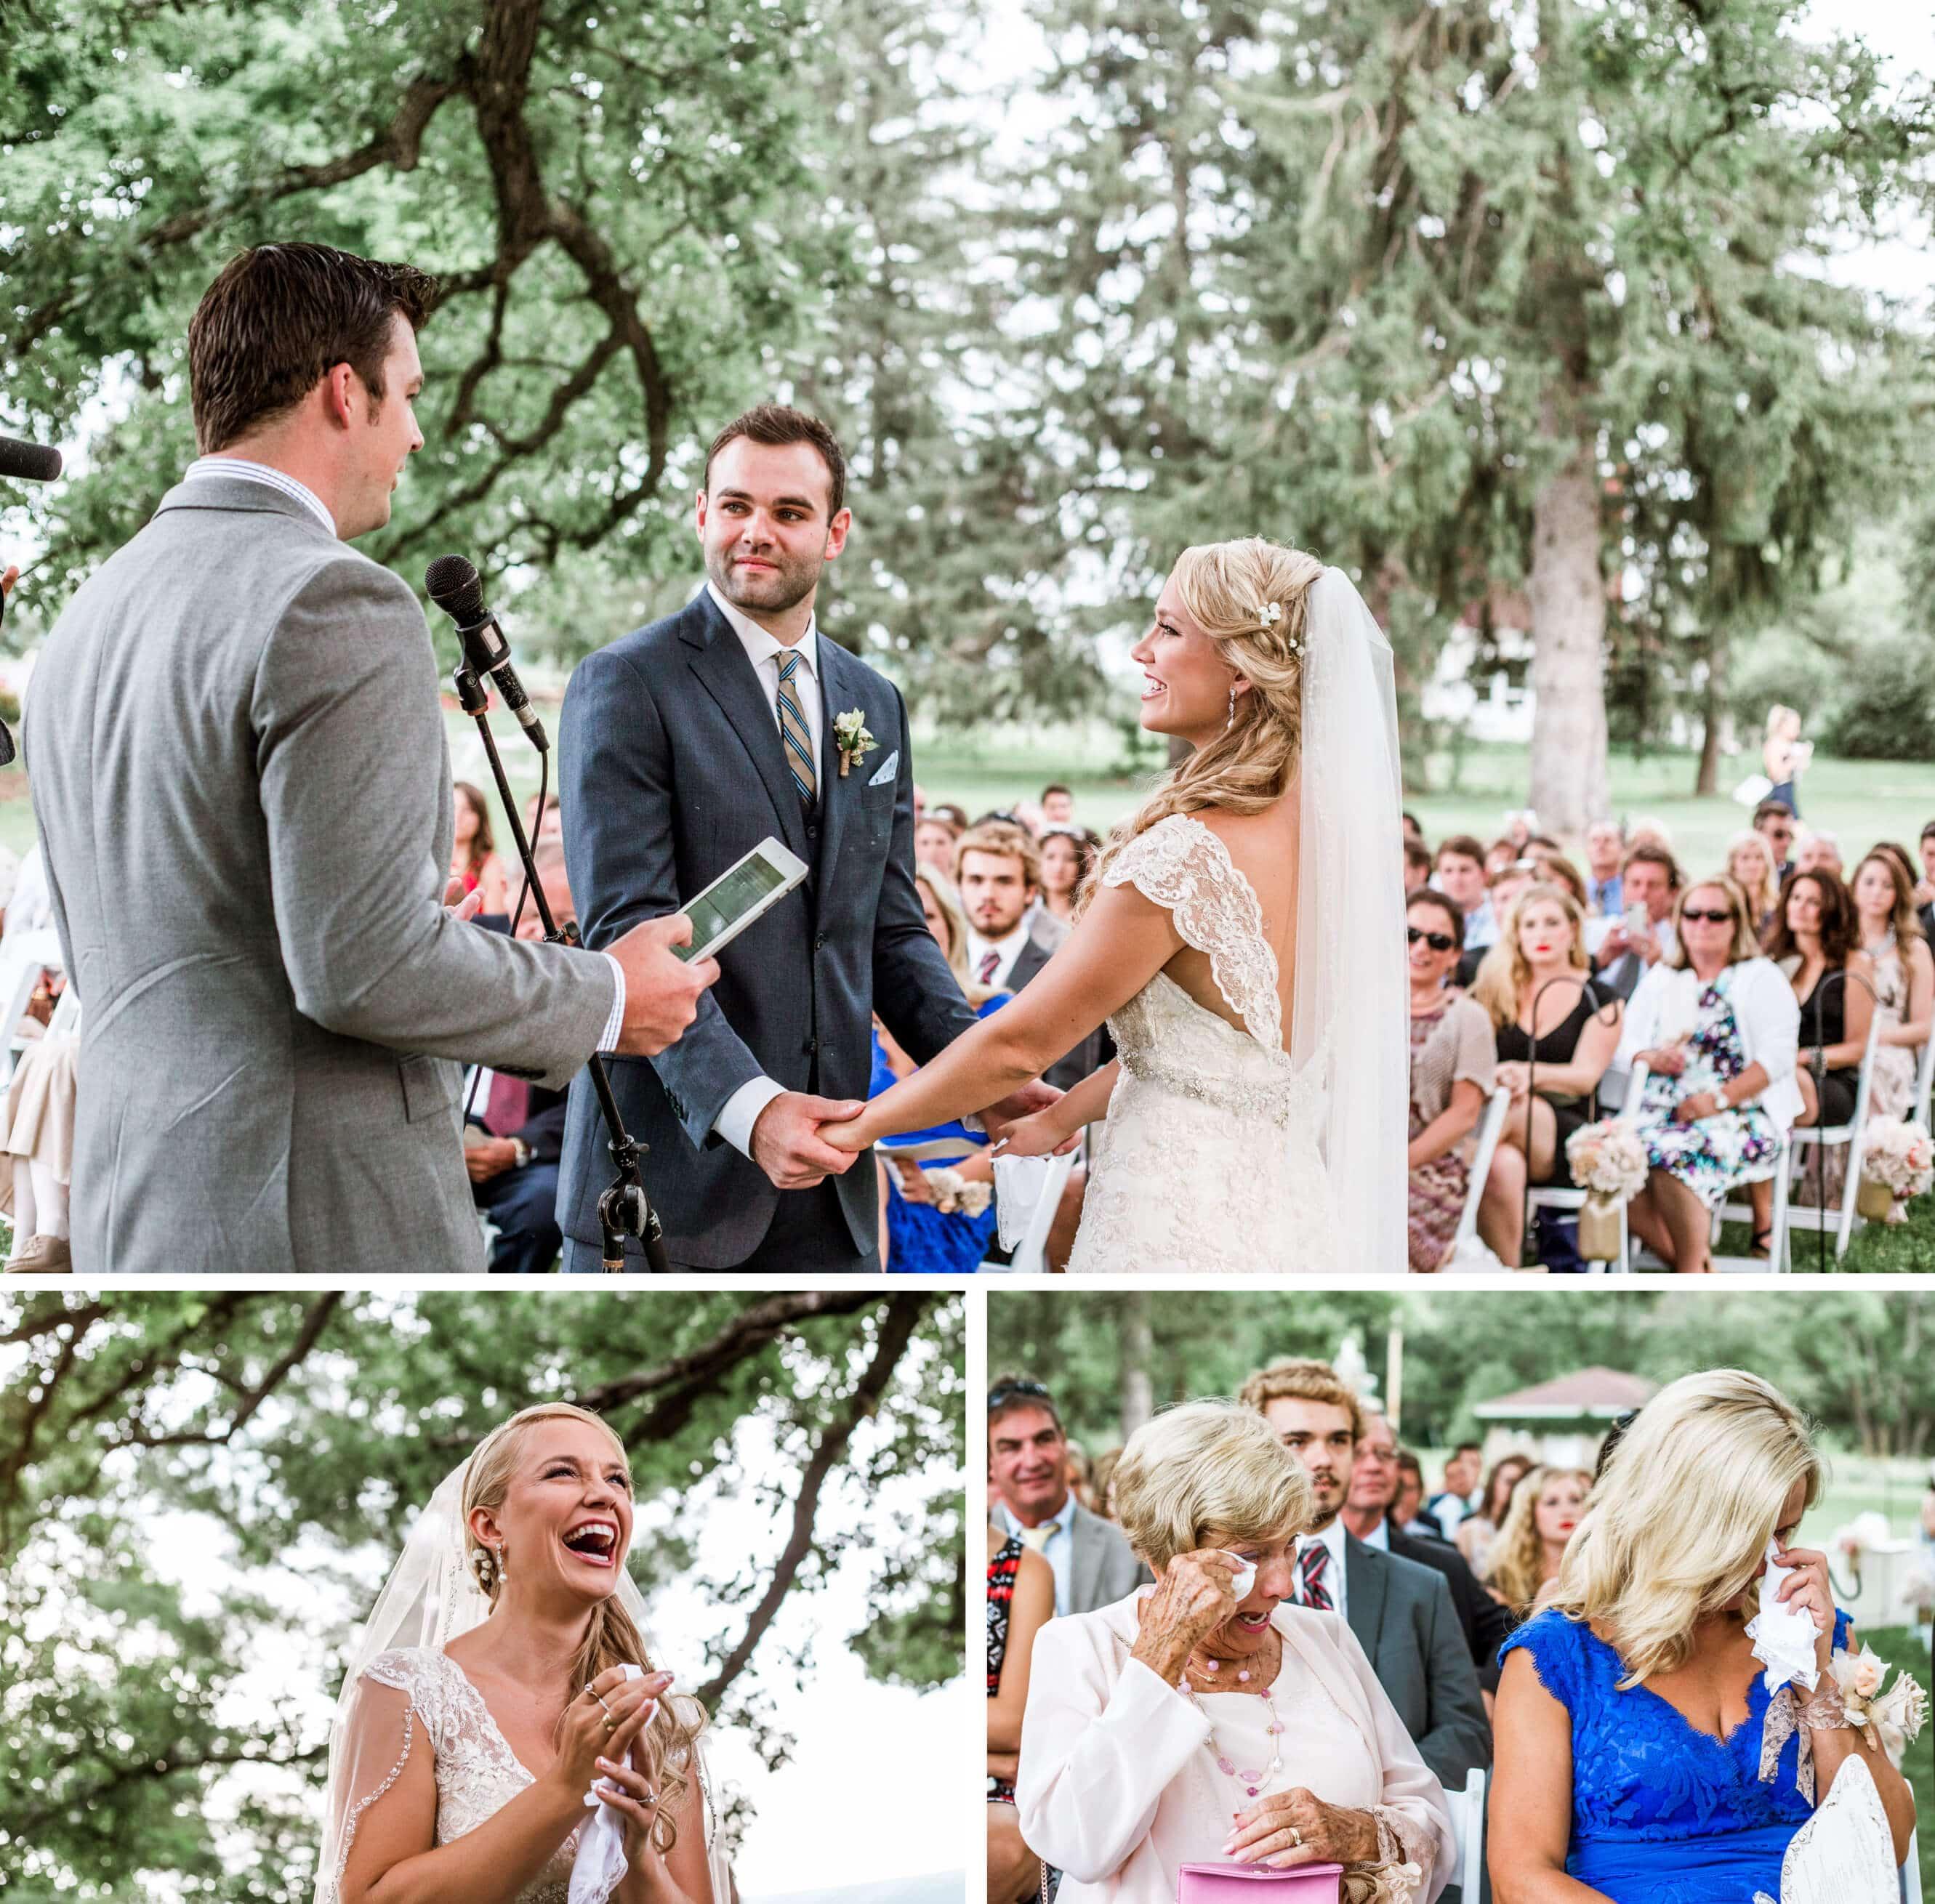 Oak tree ceremony vows - Sussex Wedding Photographer